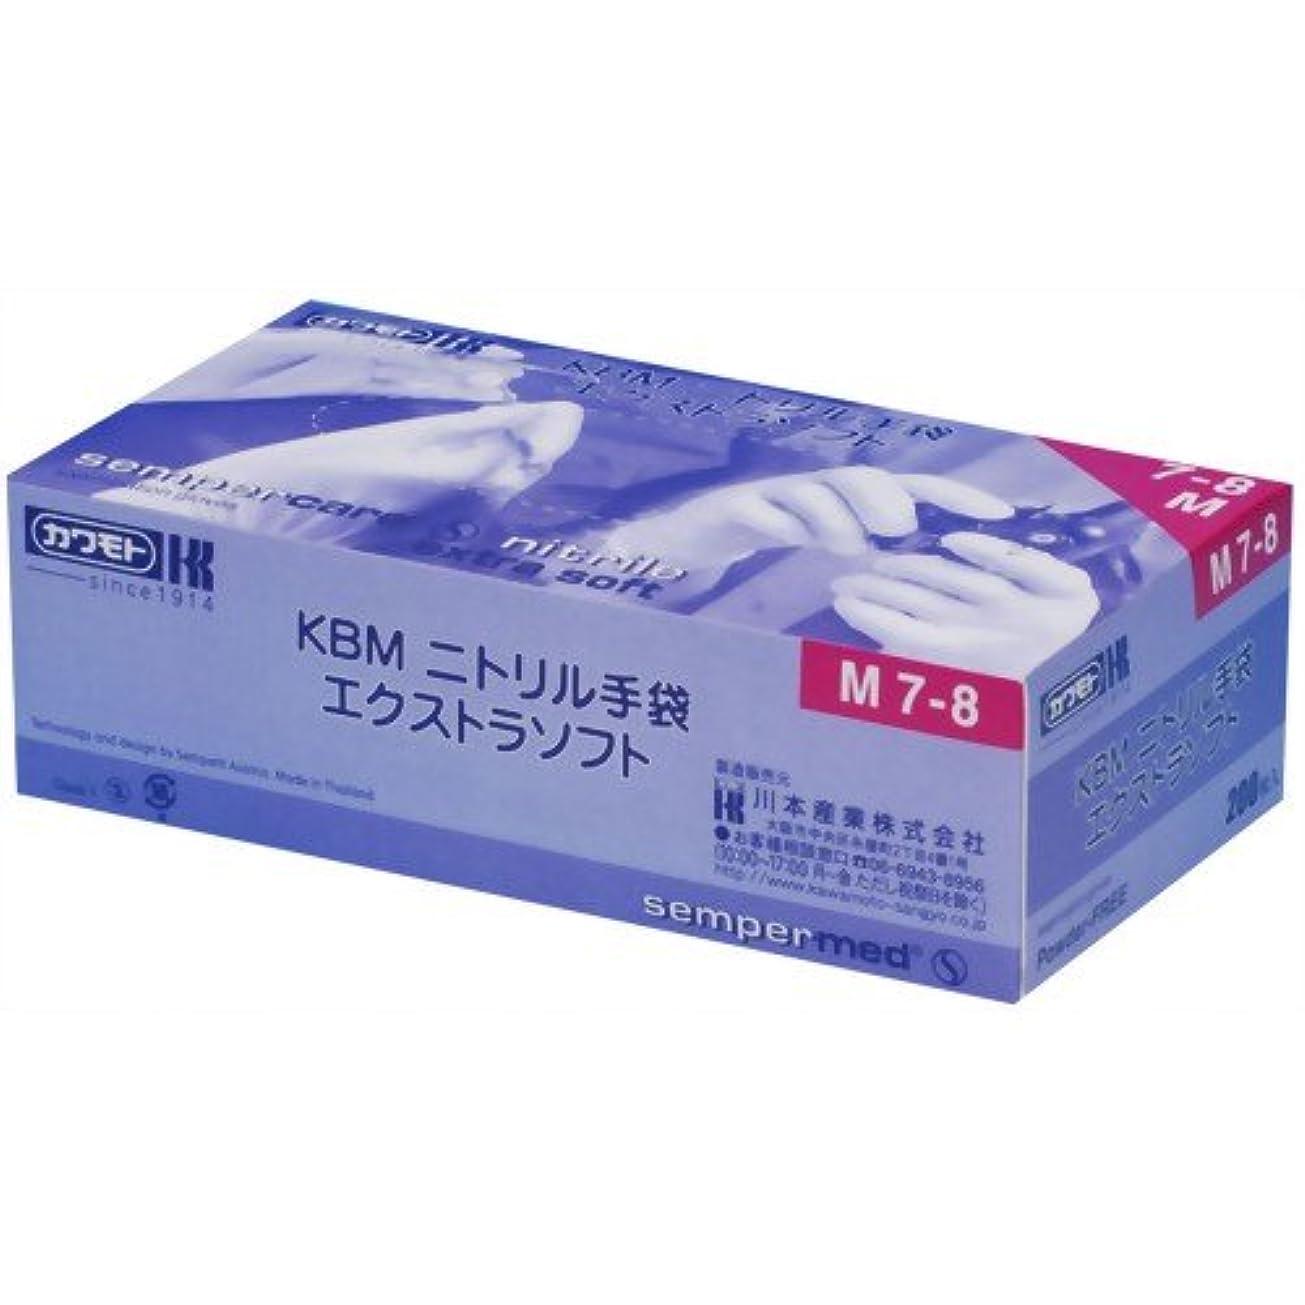 KBMニトリル手袋PF エクストラソフト Sサイズ200枚